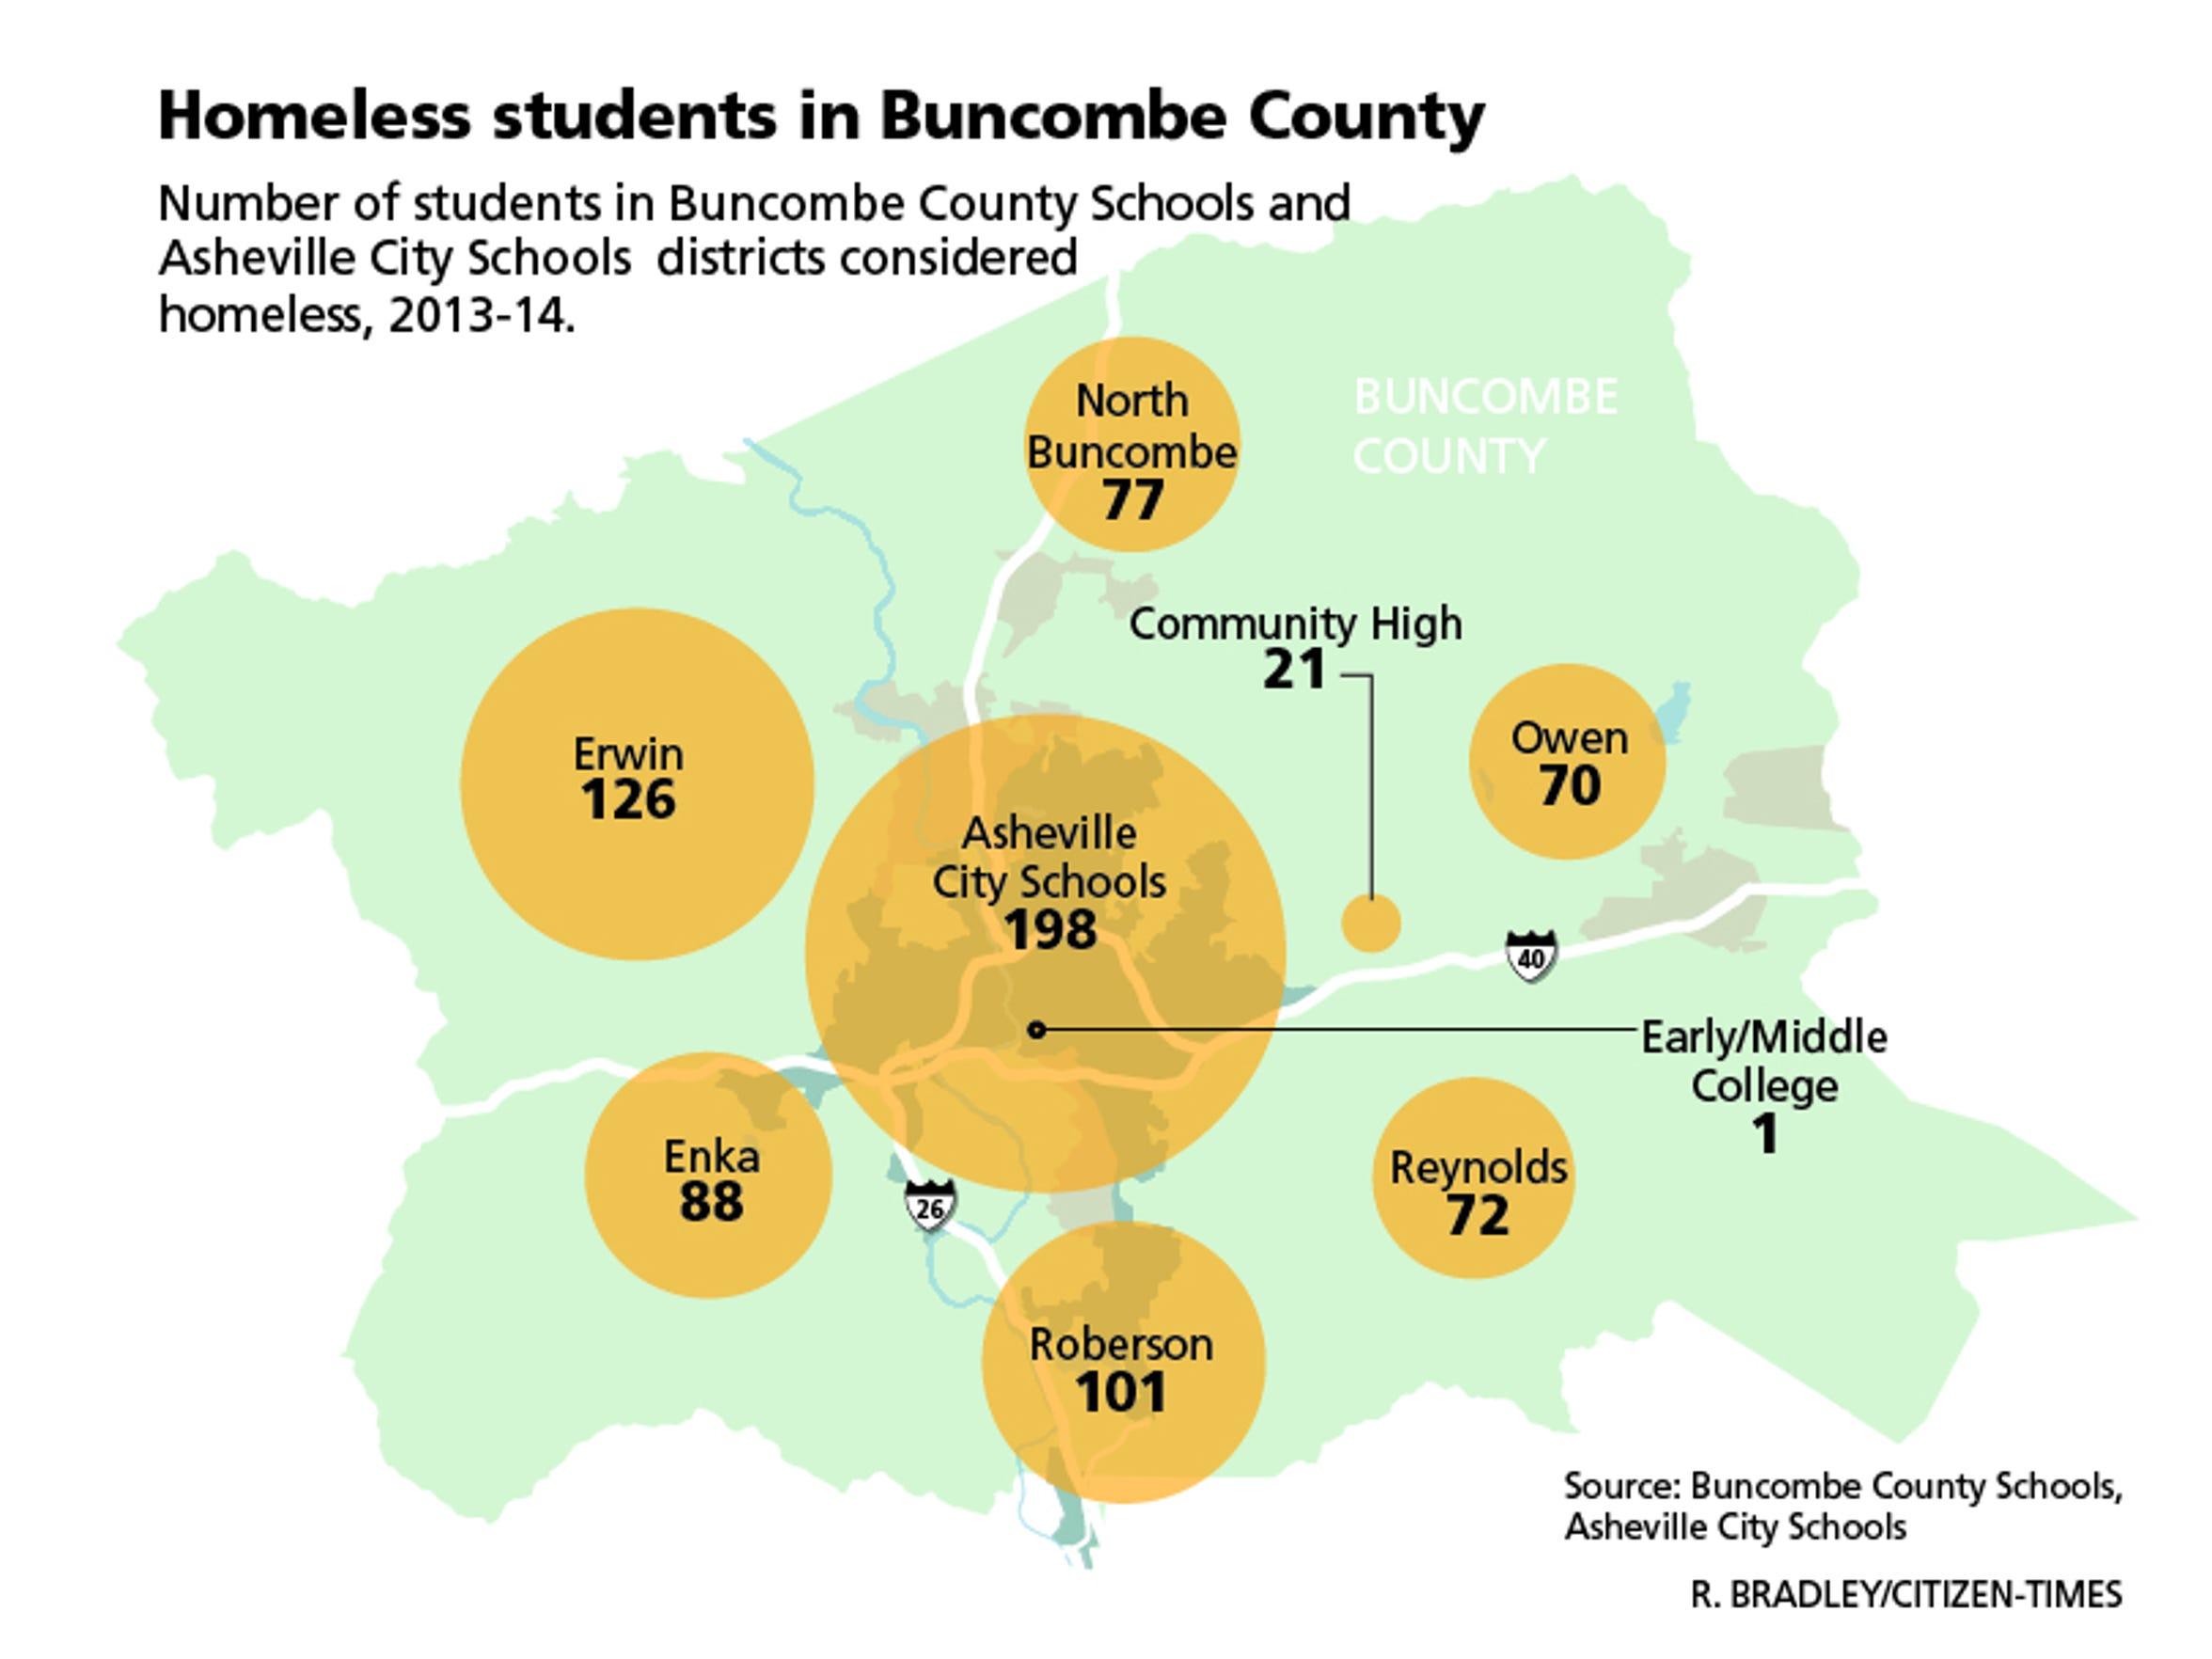 buncombe_student_homeless